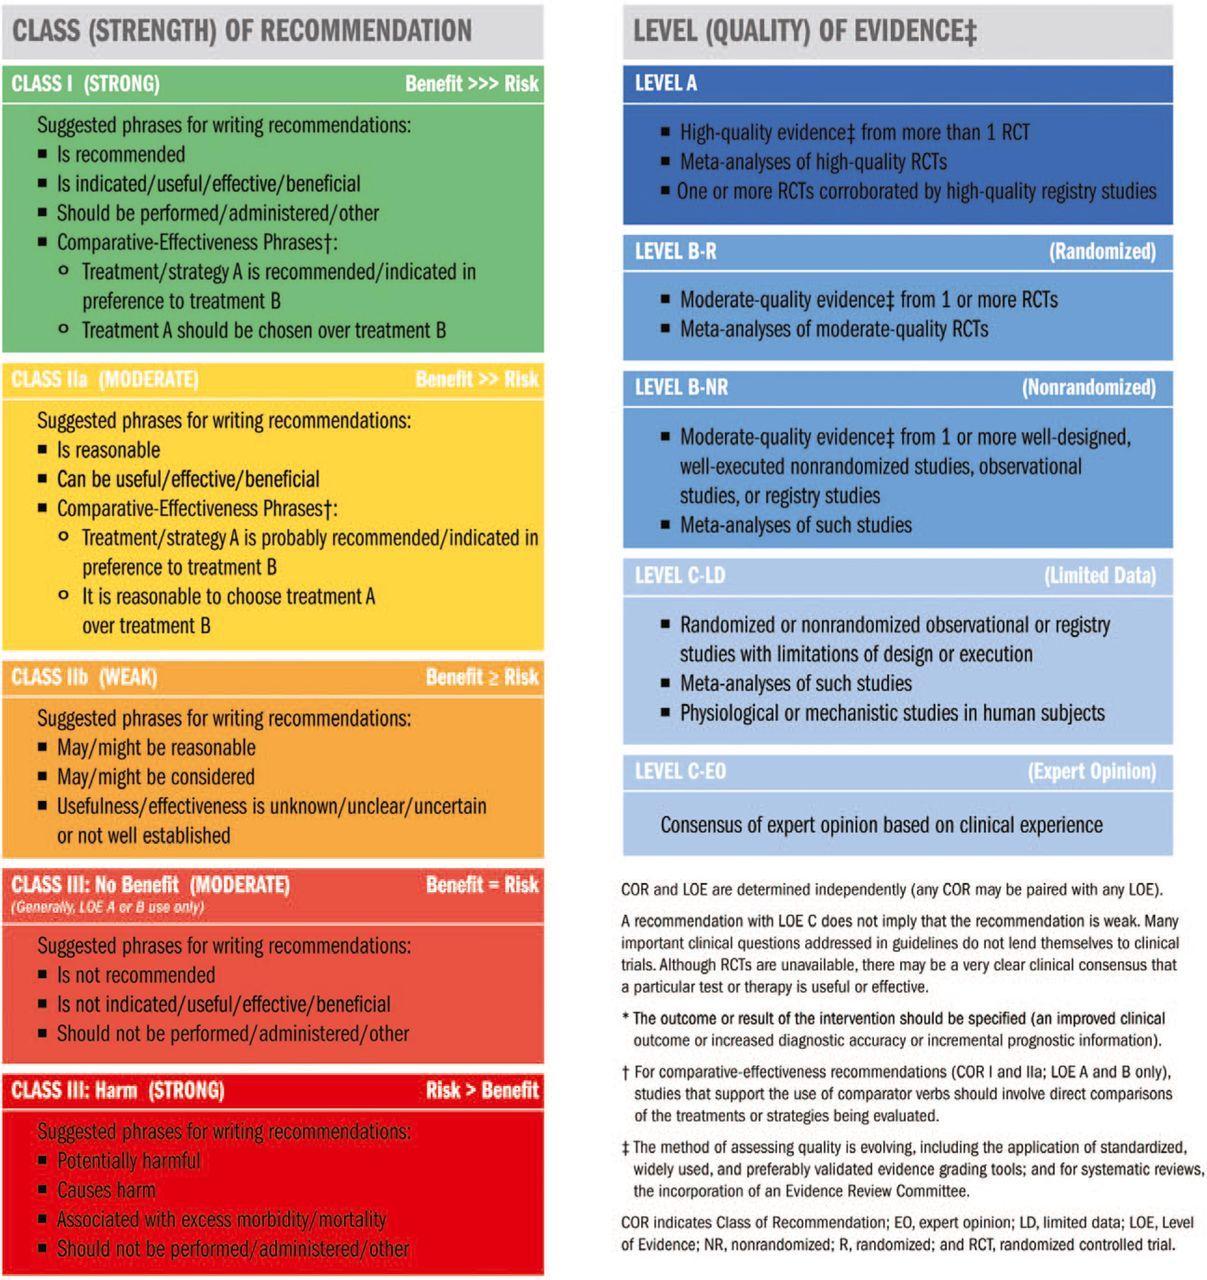 Acc Aha Hfsa Focused Update On New Pharmacological